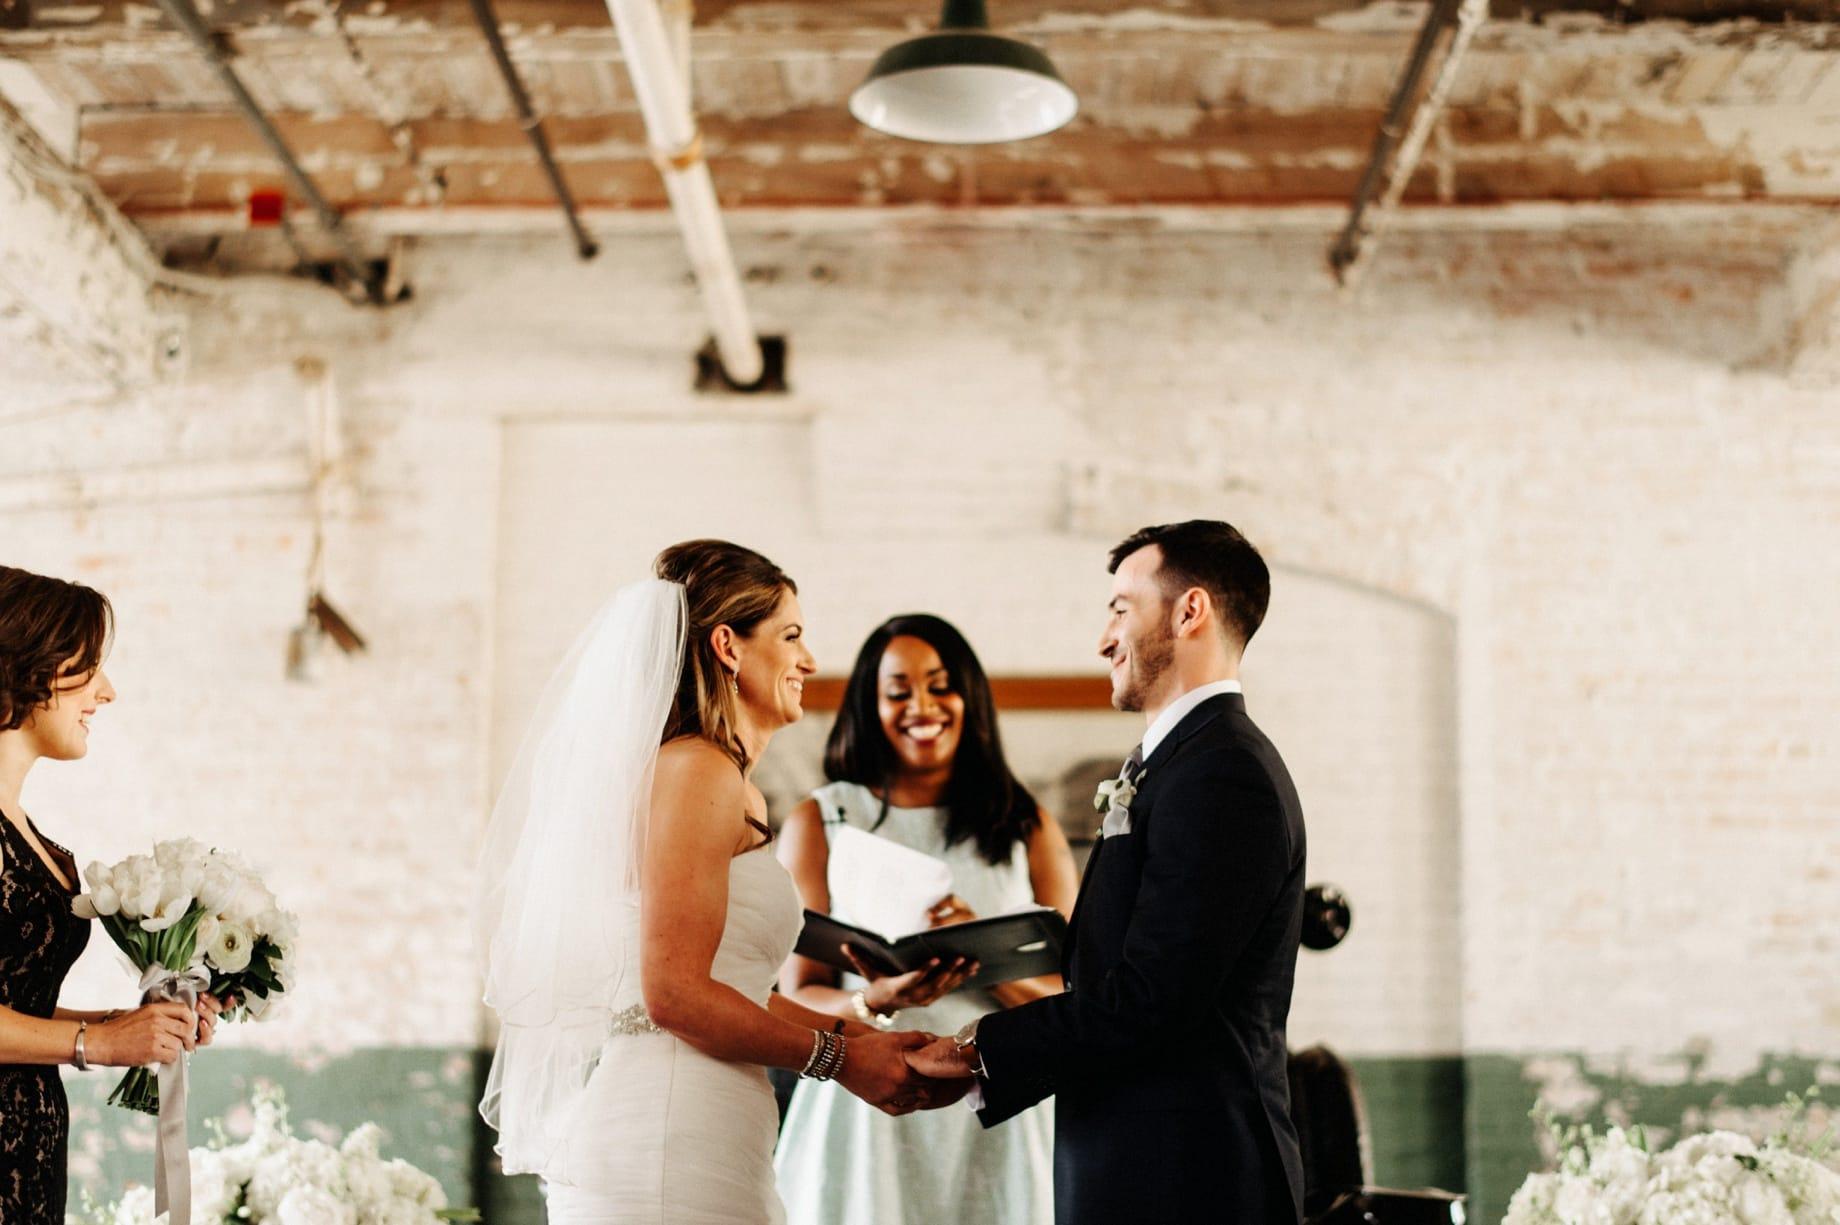 wedding ceremony at ford piquette plant by Detroit Wedding photographer Heather Jowett